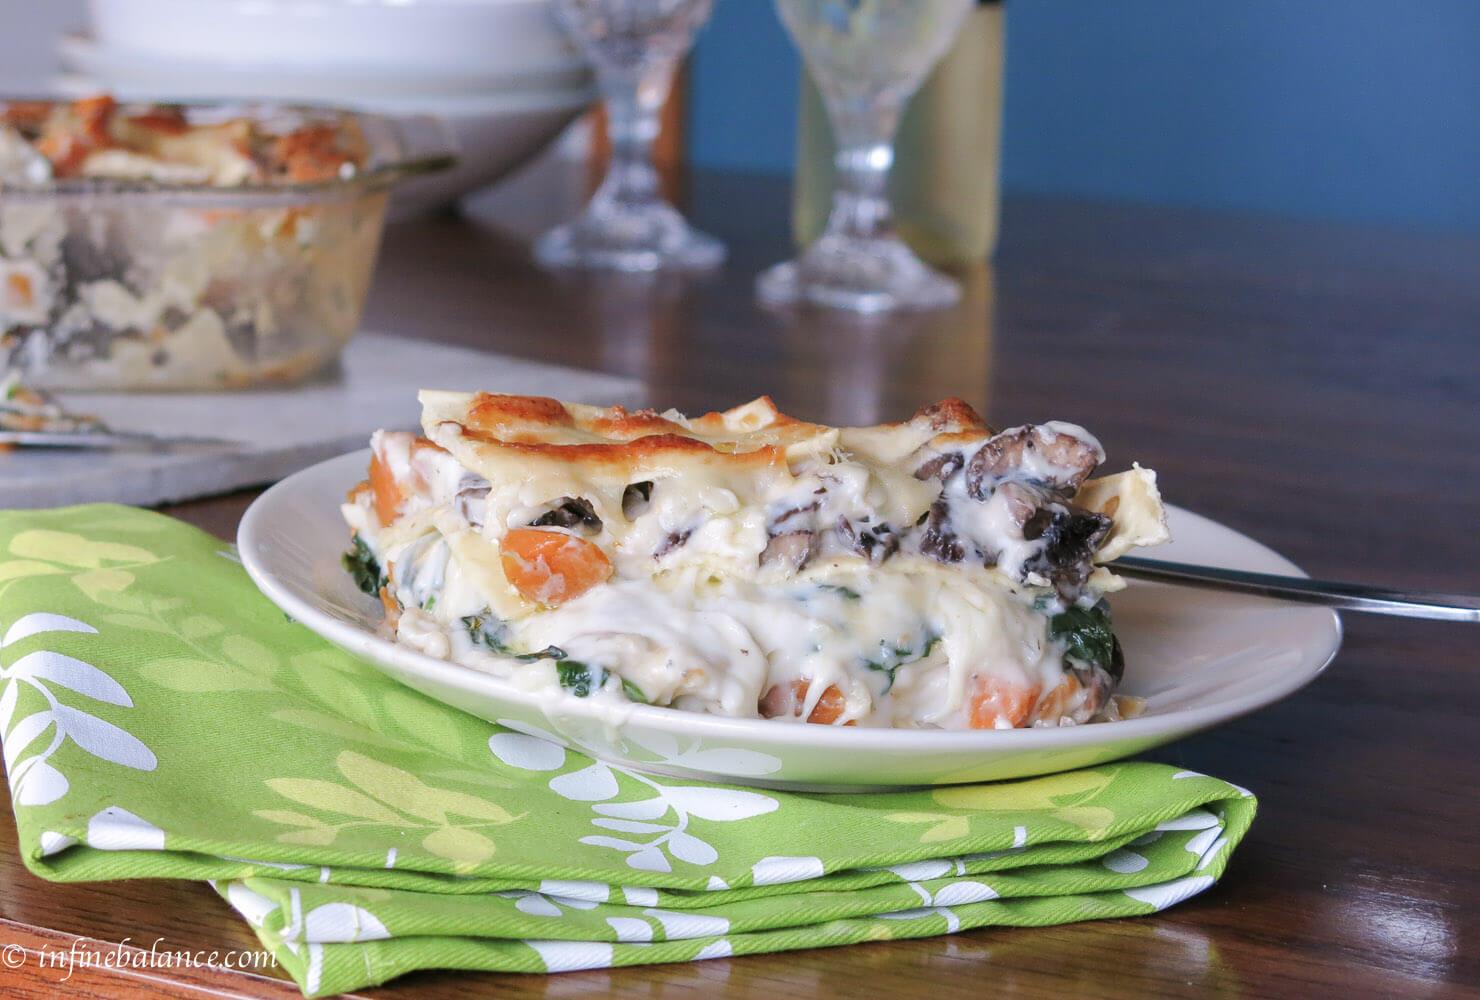 Vegetarian Lasagna with Sweet Potatoes and Portabella Mushrooms